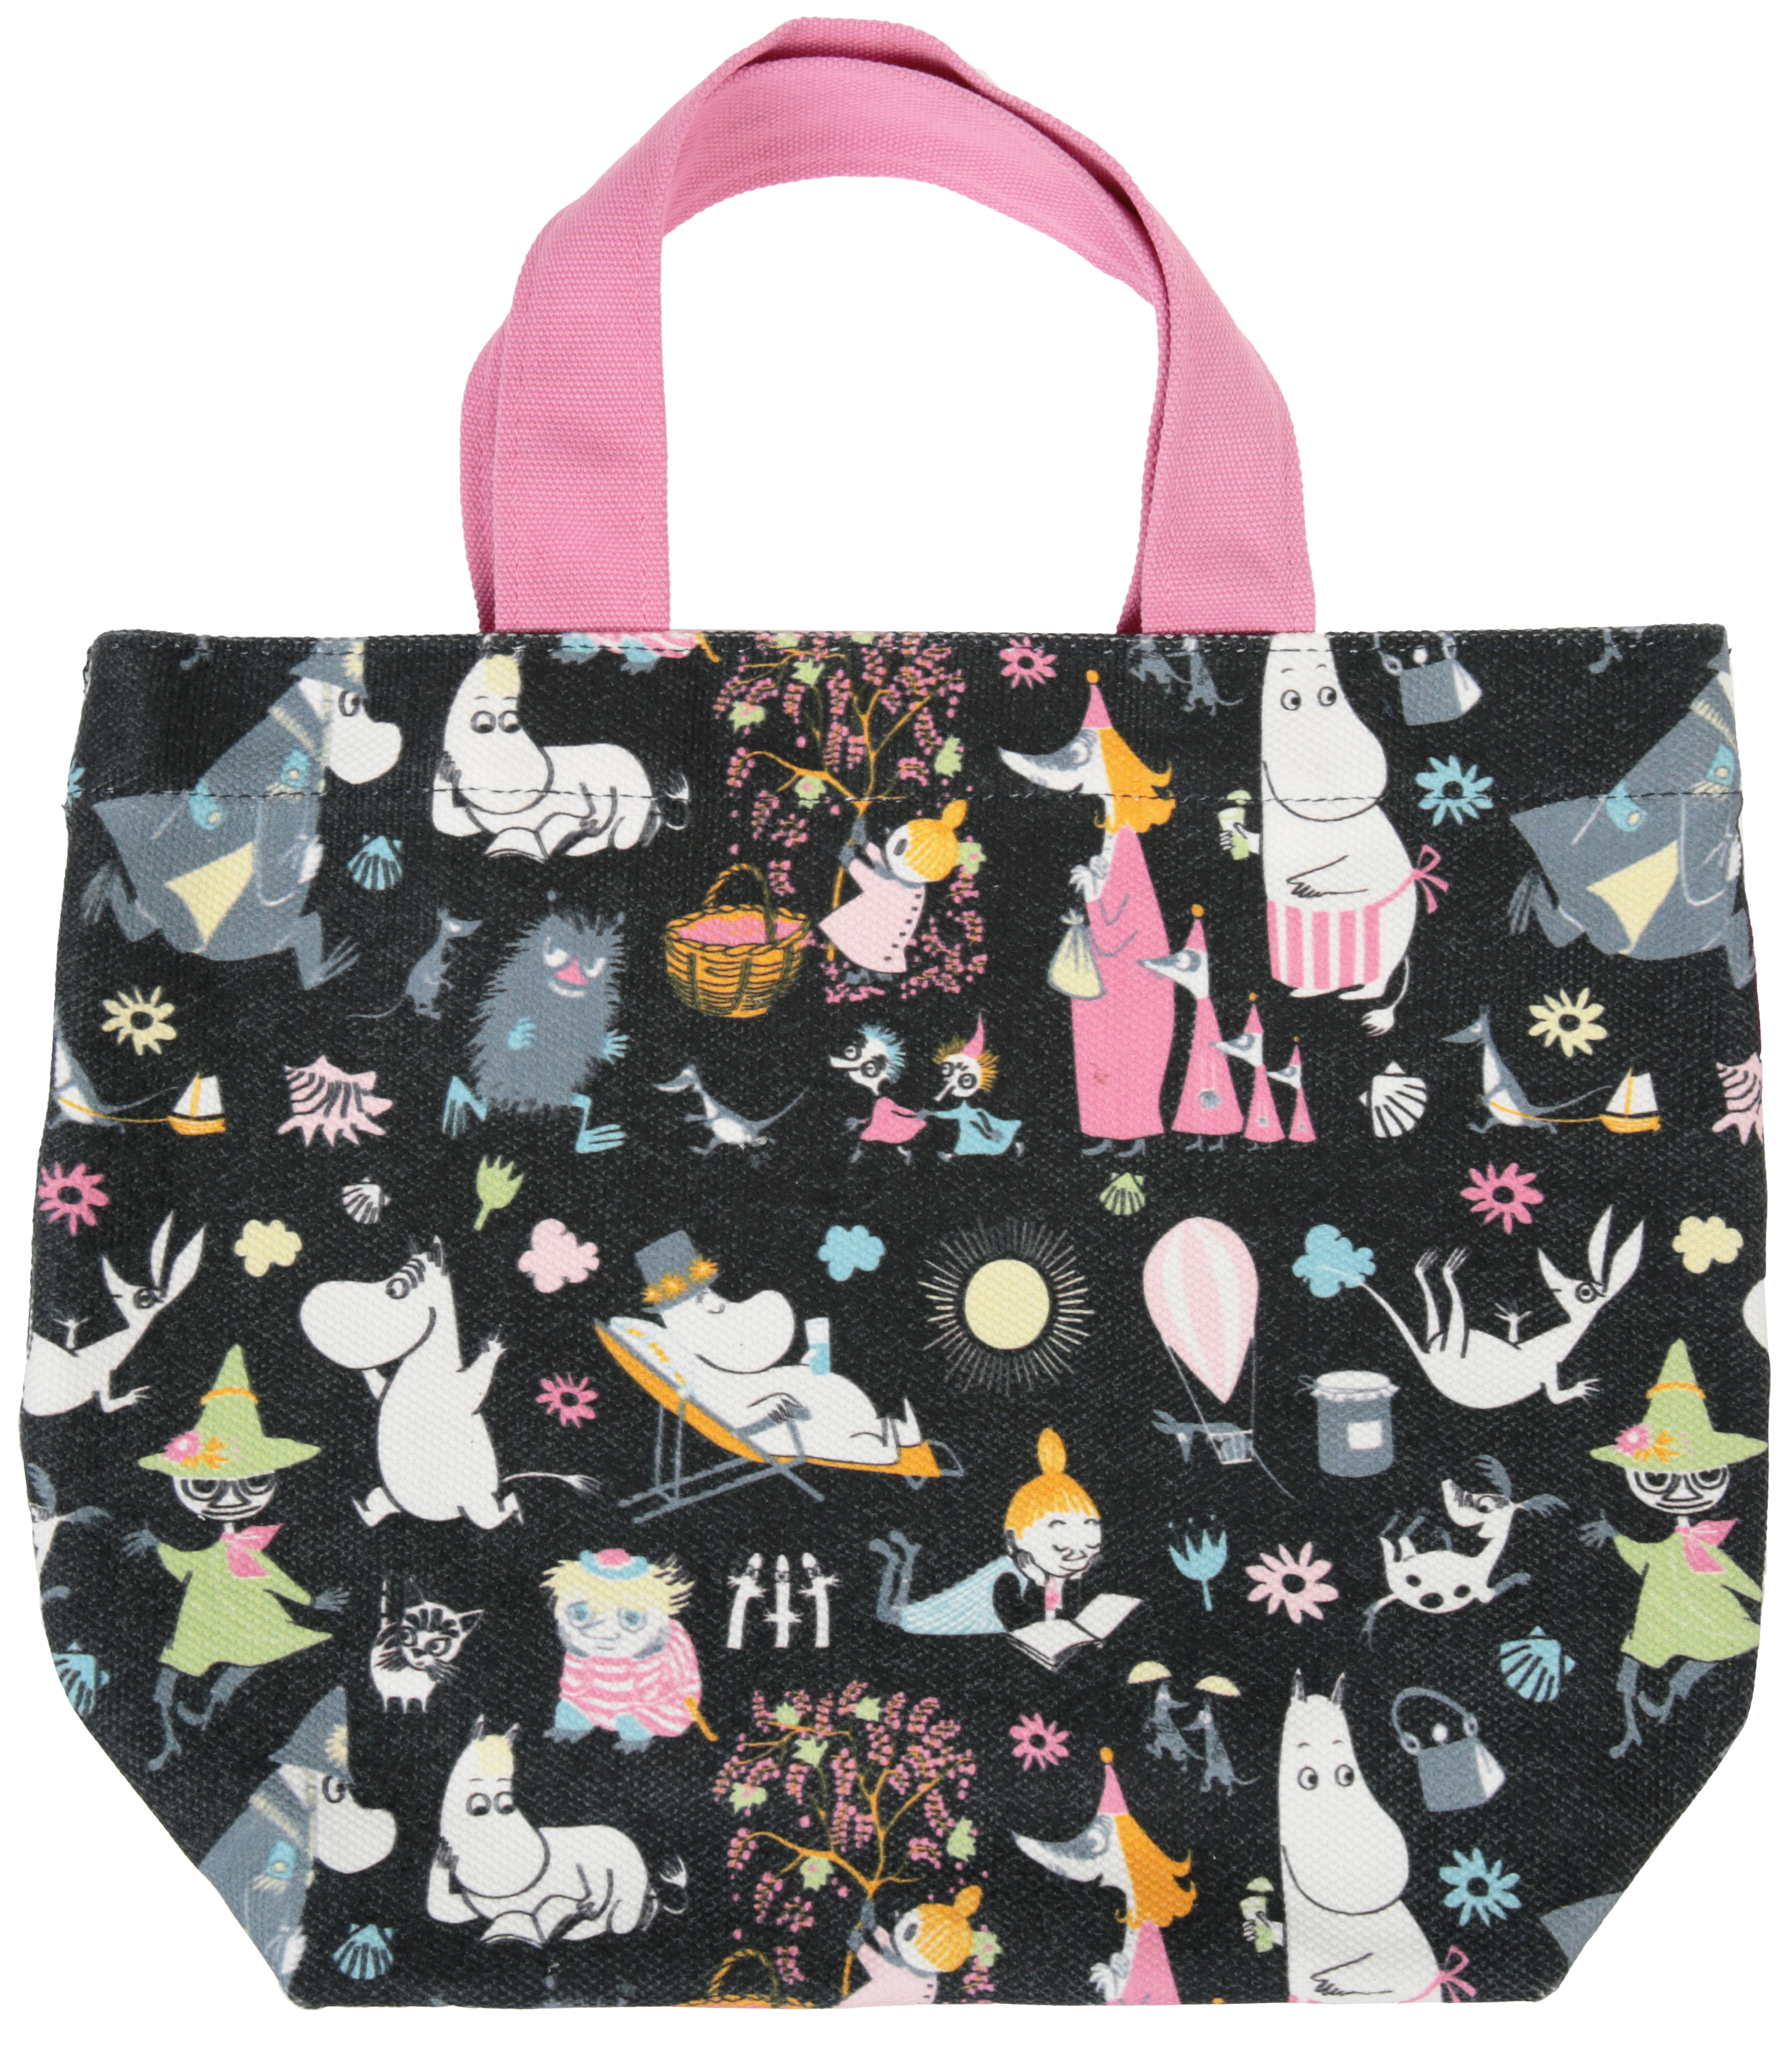 Martinex Launo Bag Many Moomins